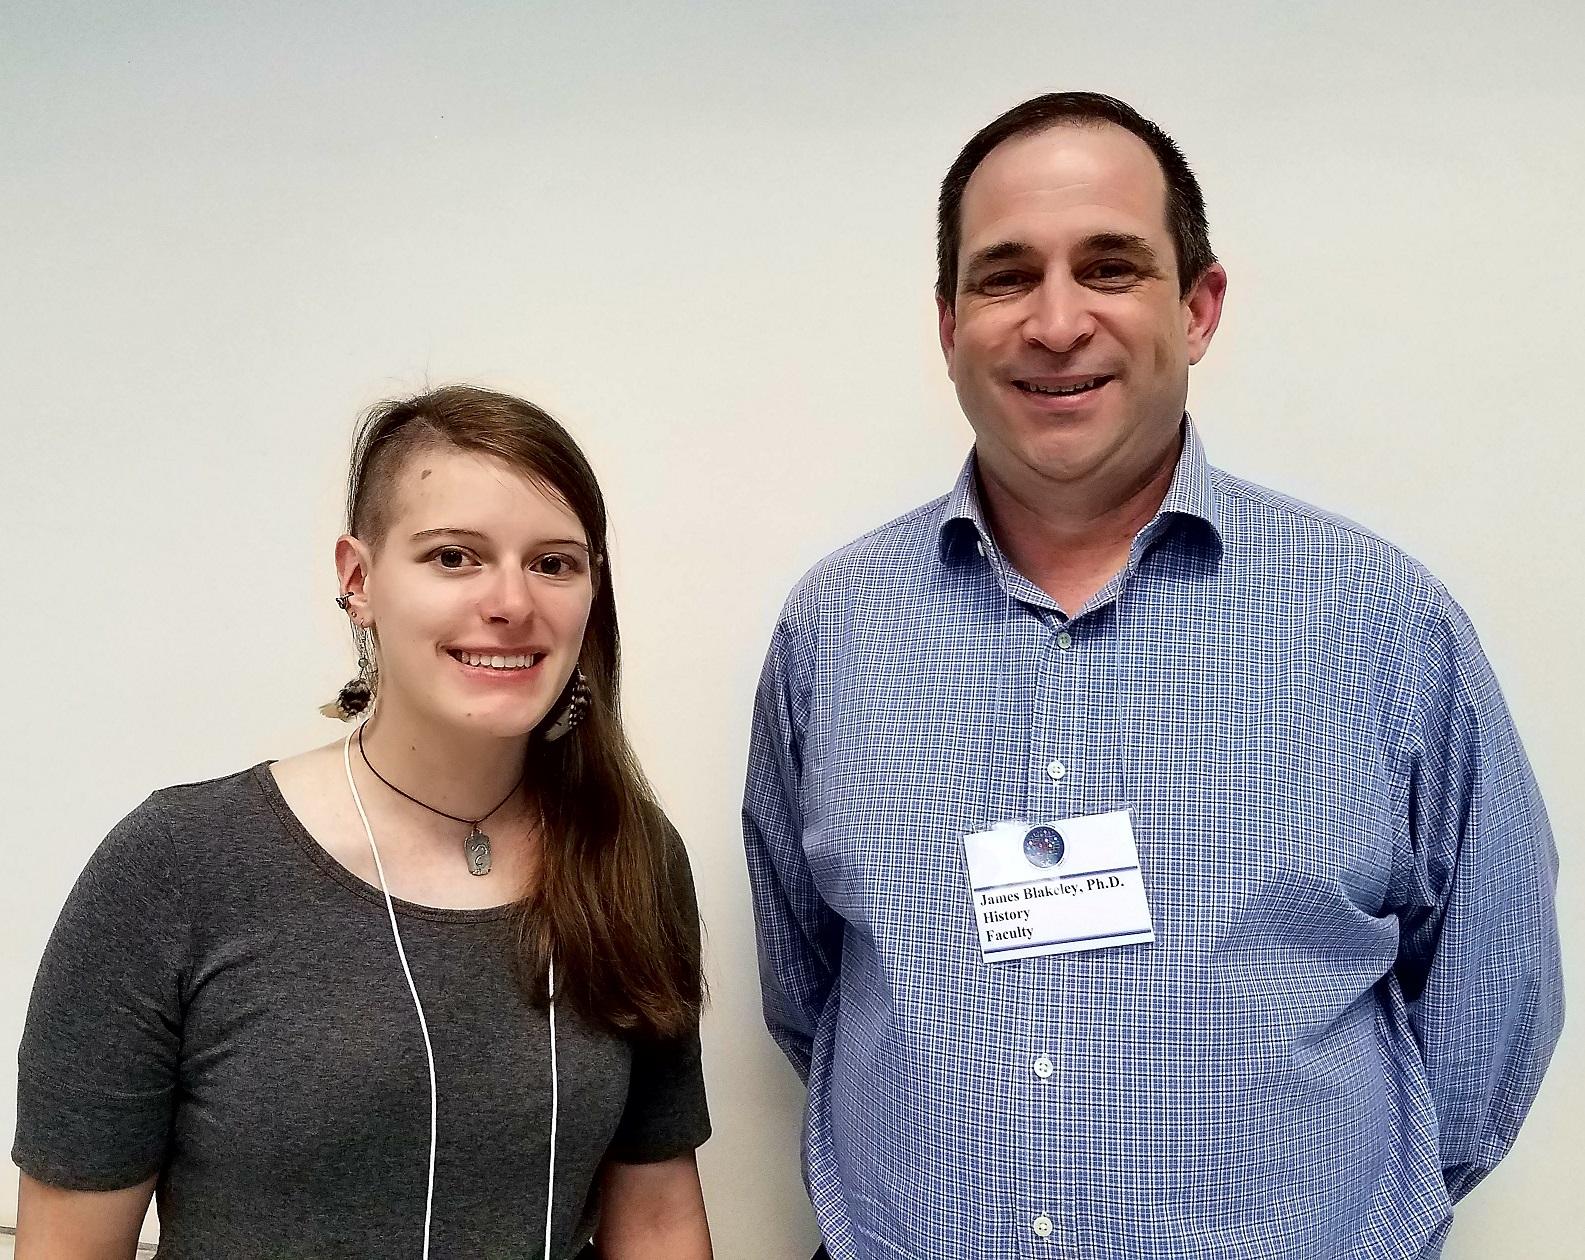 Photo of Jessica Gagliardi and Dr. James Blakeley